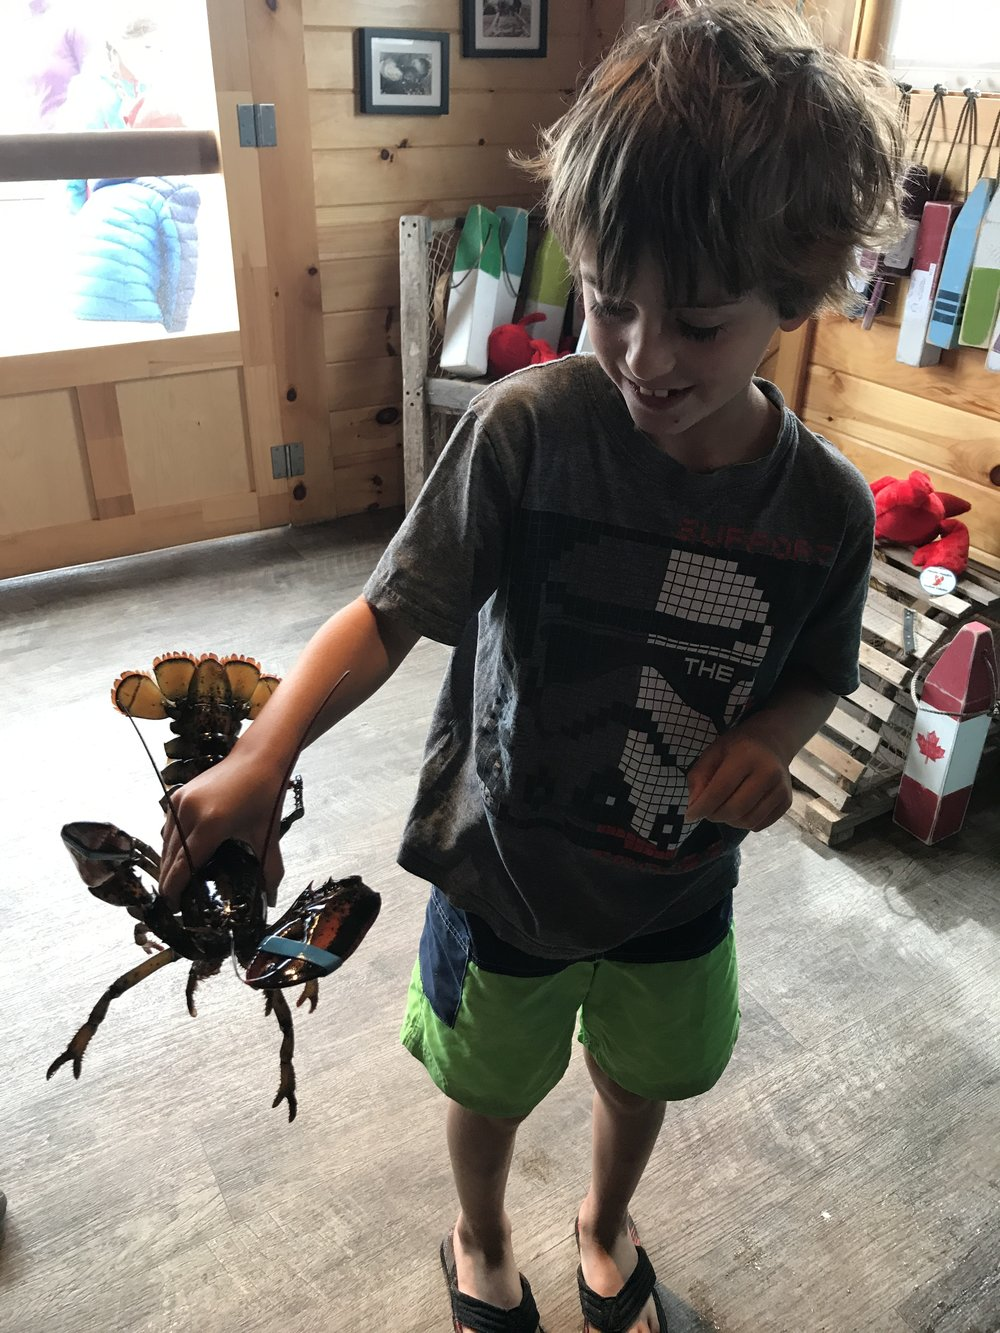 PEI lobster...yum!